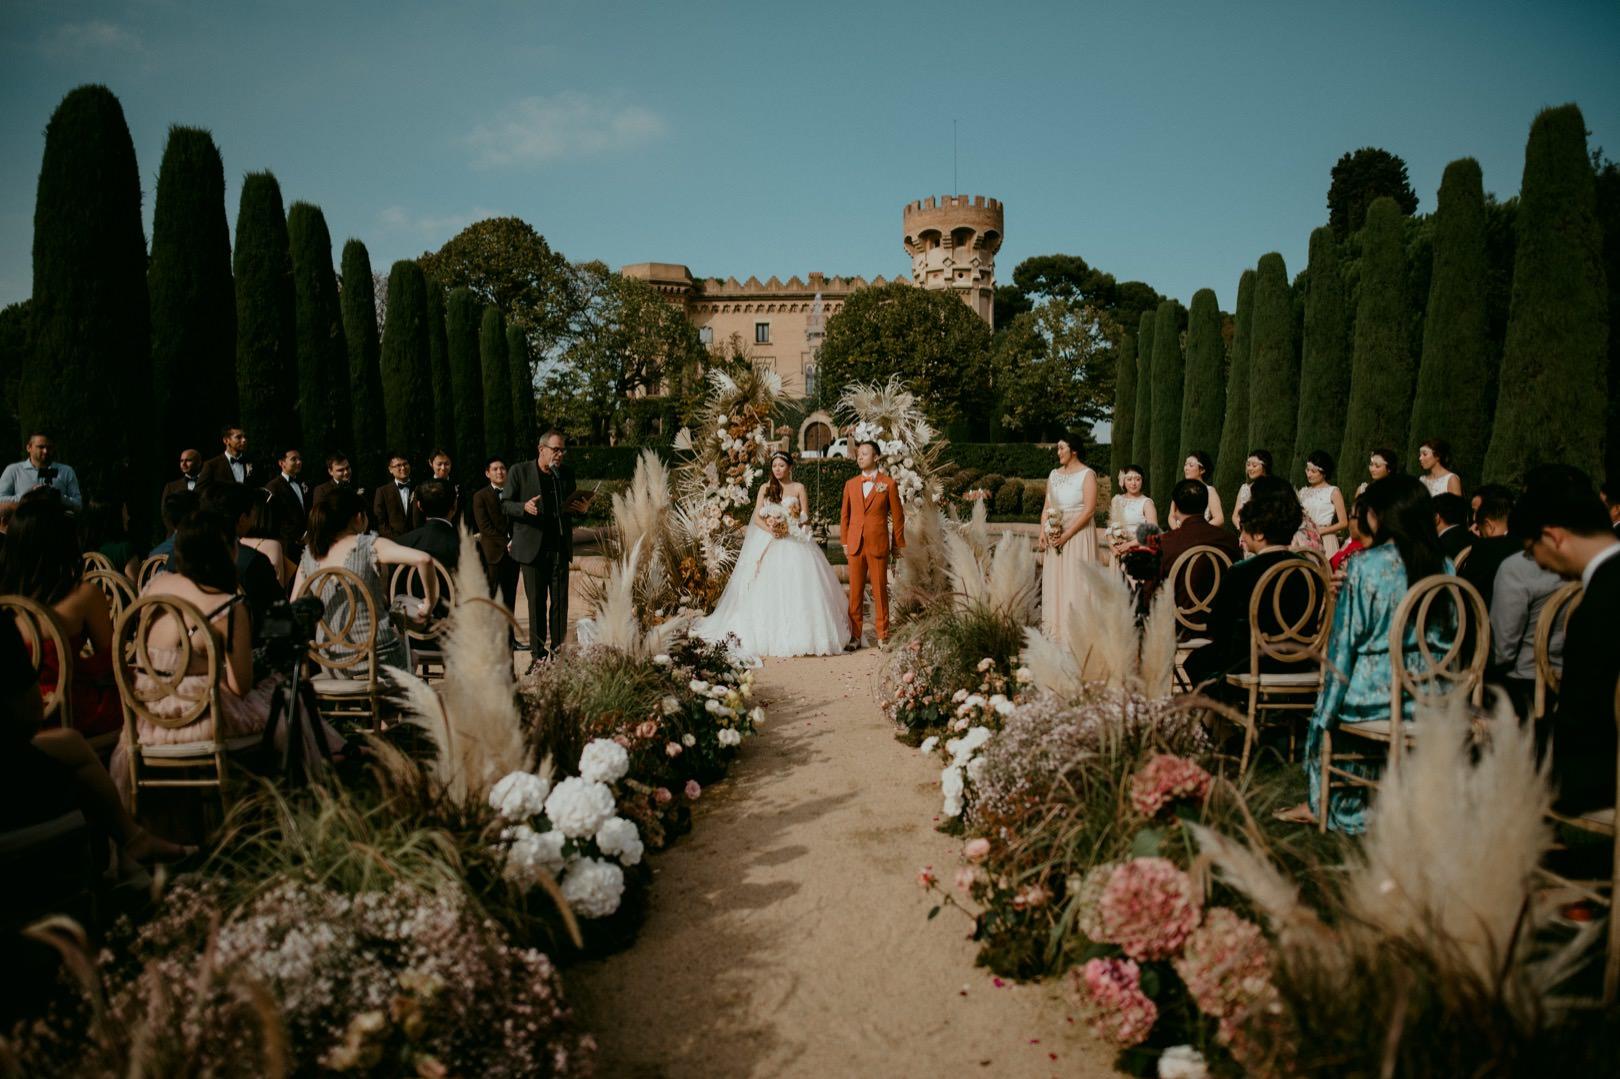 Castell de Sant Marcal wedding photographer for luxury weddings